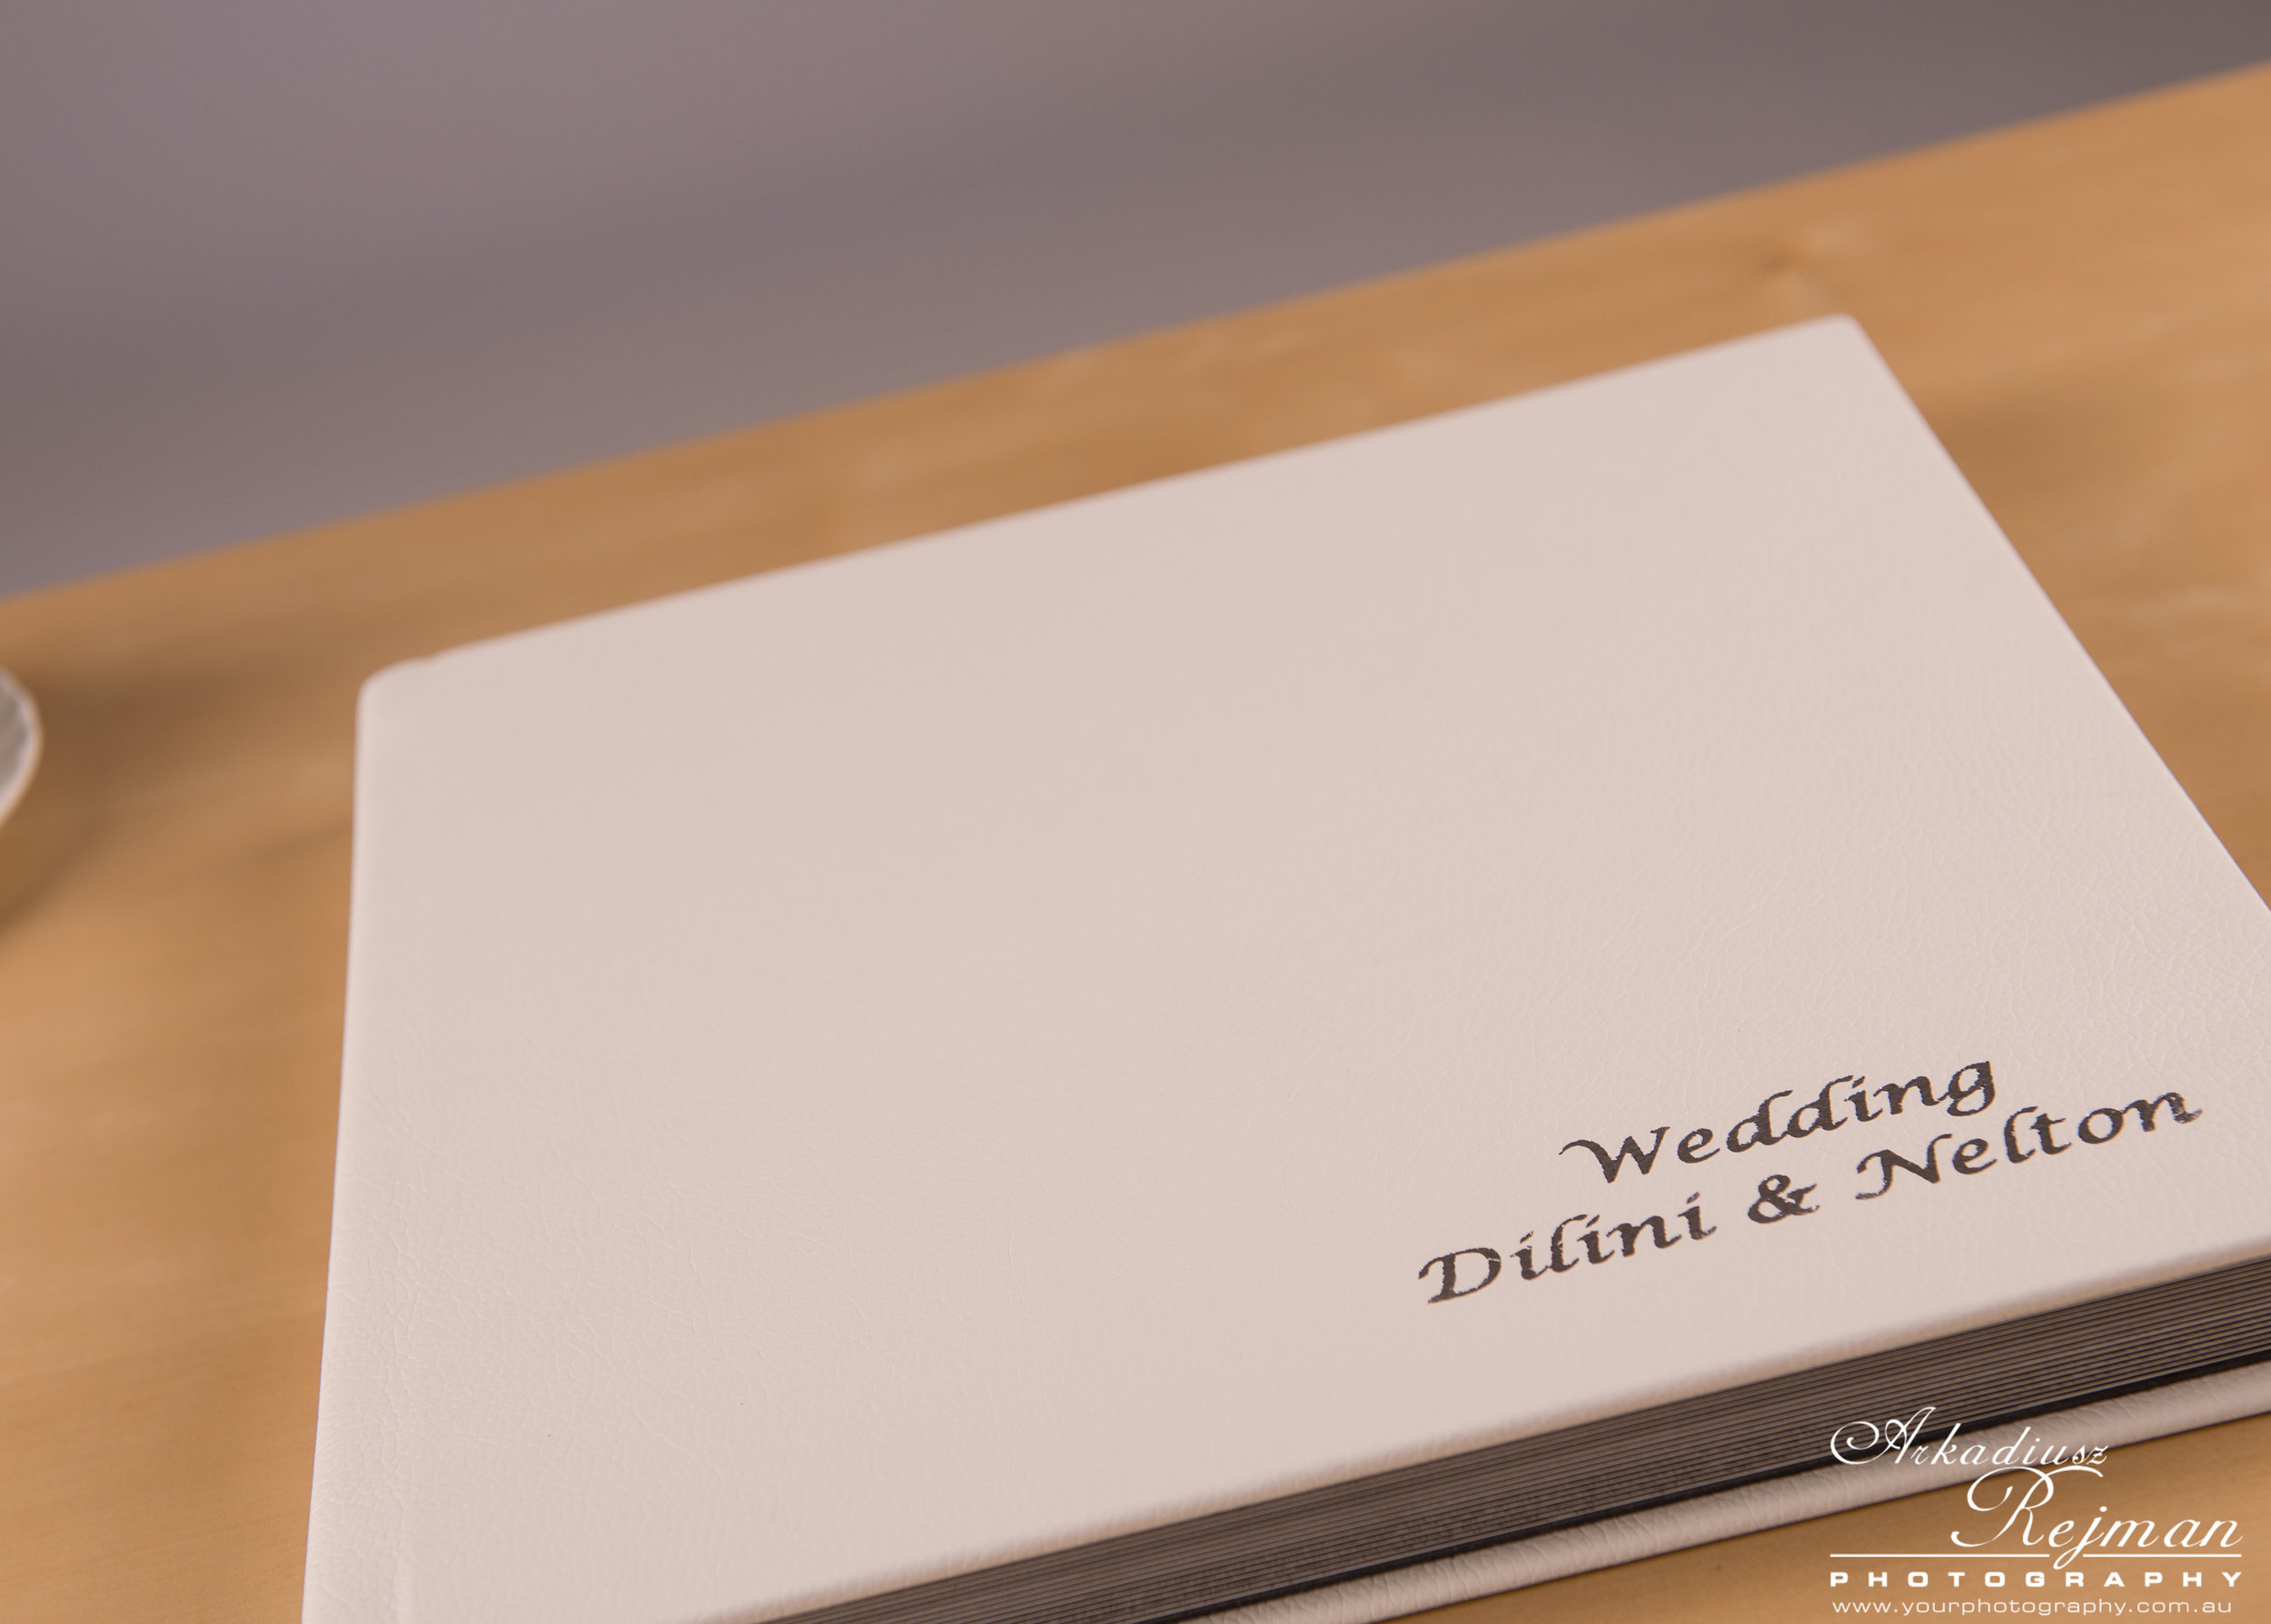 WeddingAlbum-White-0003.jpg